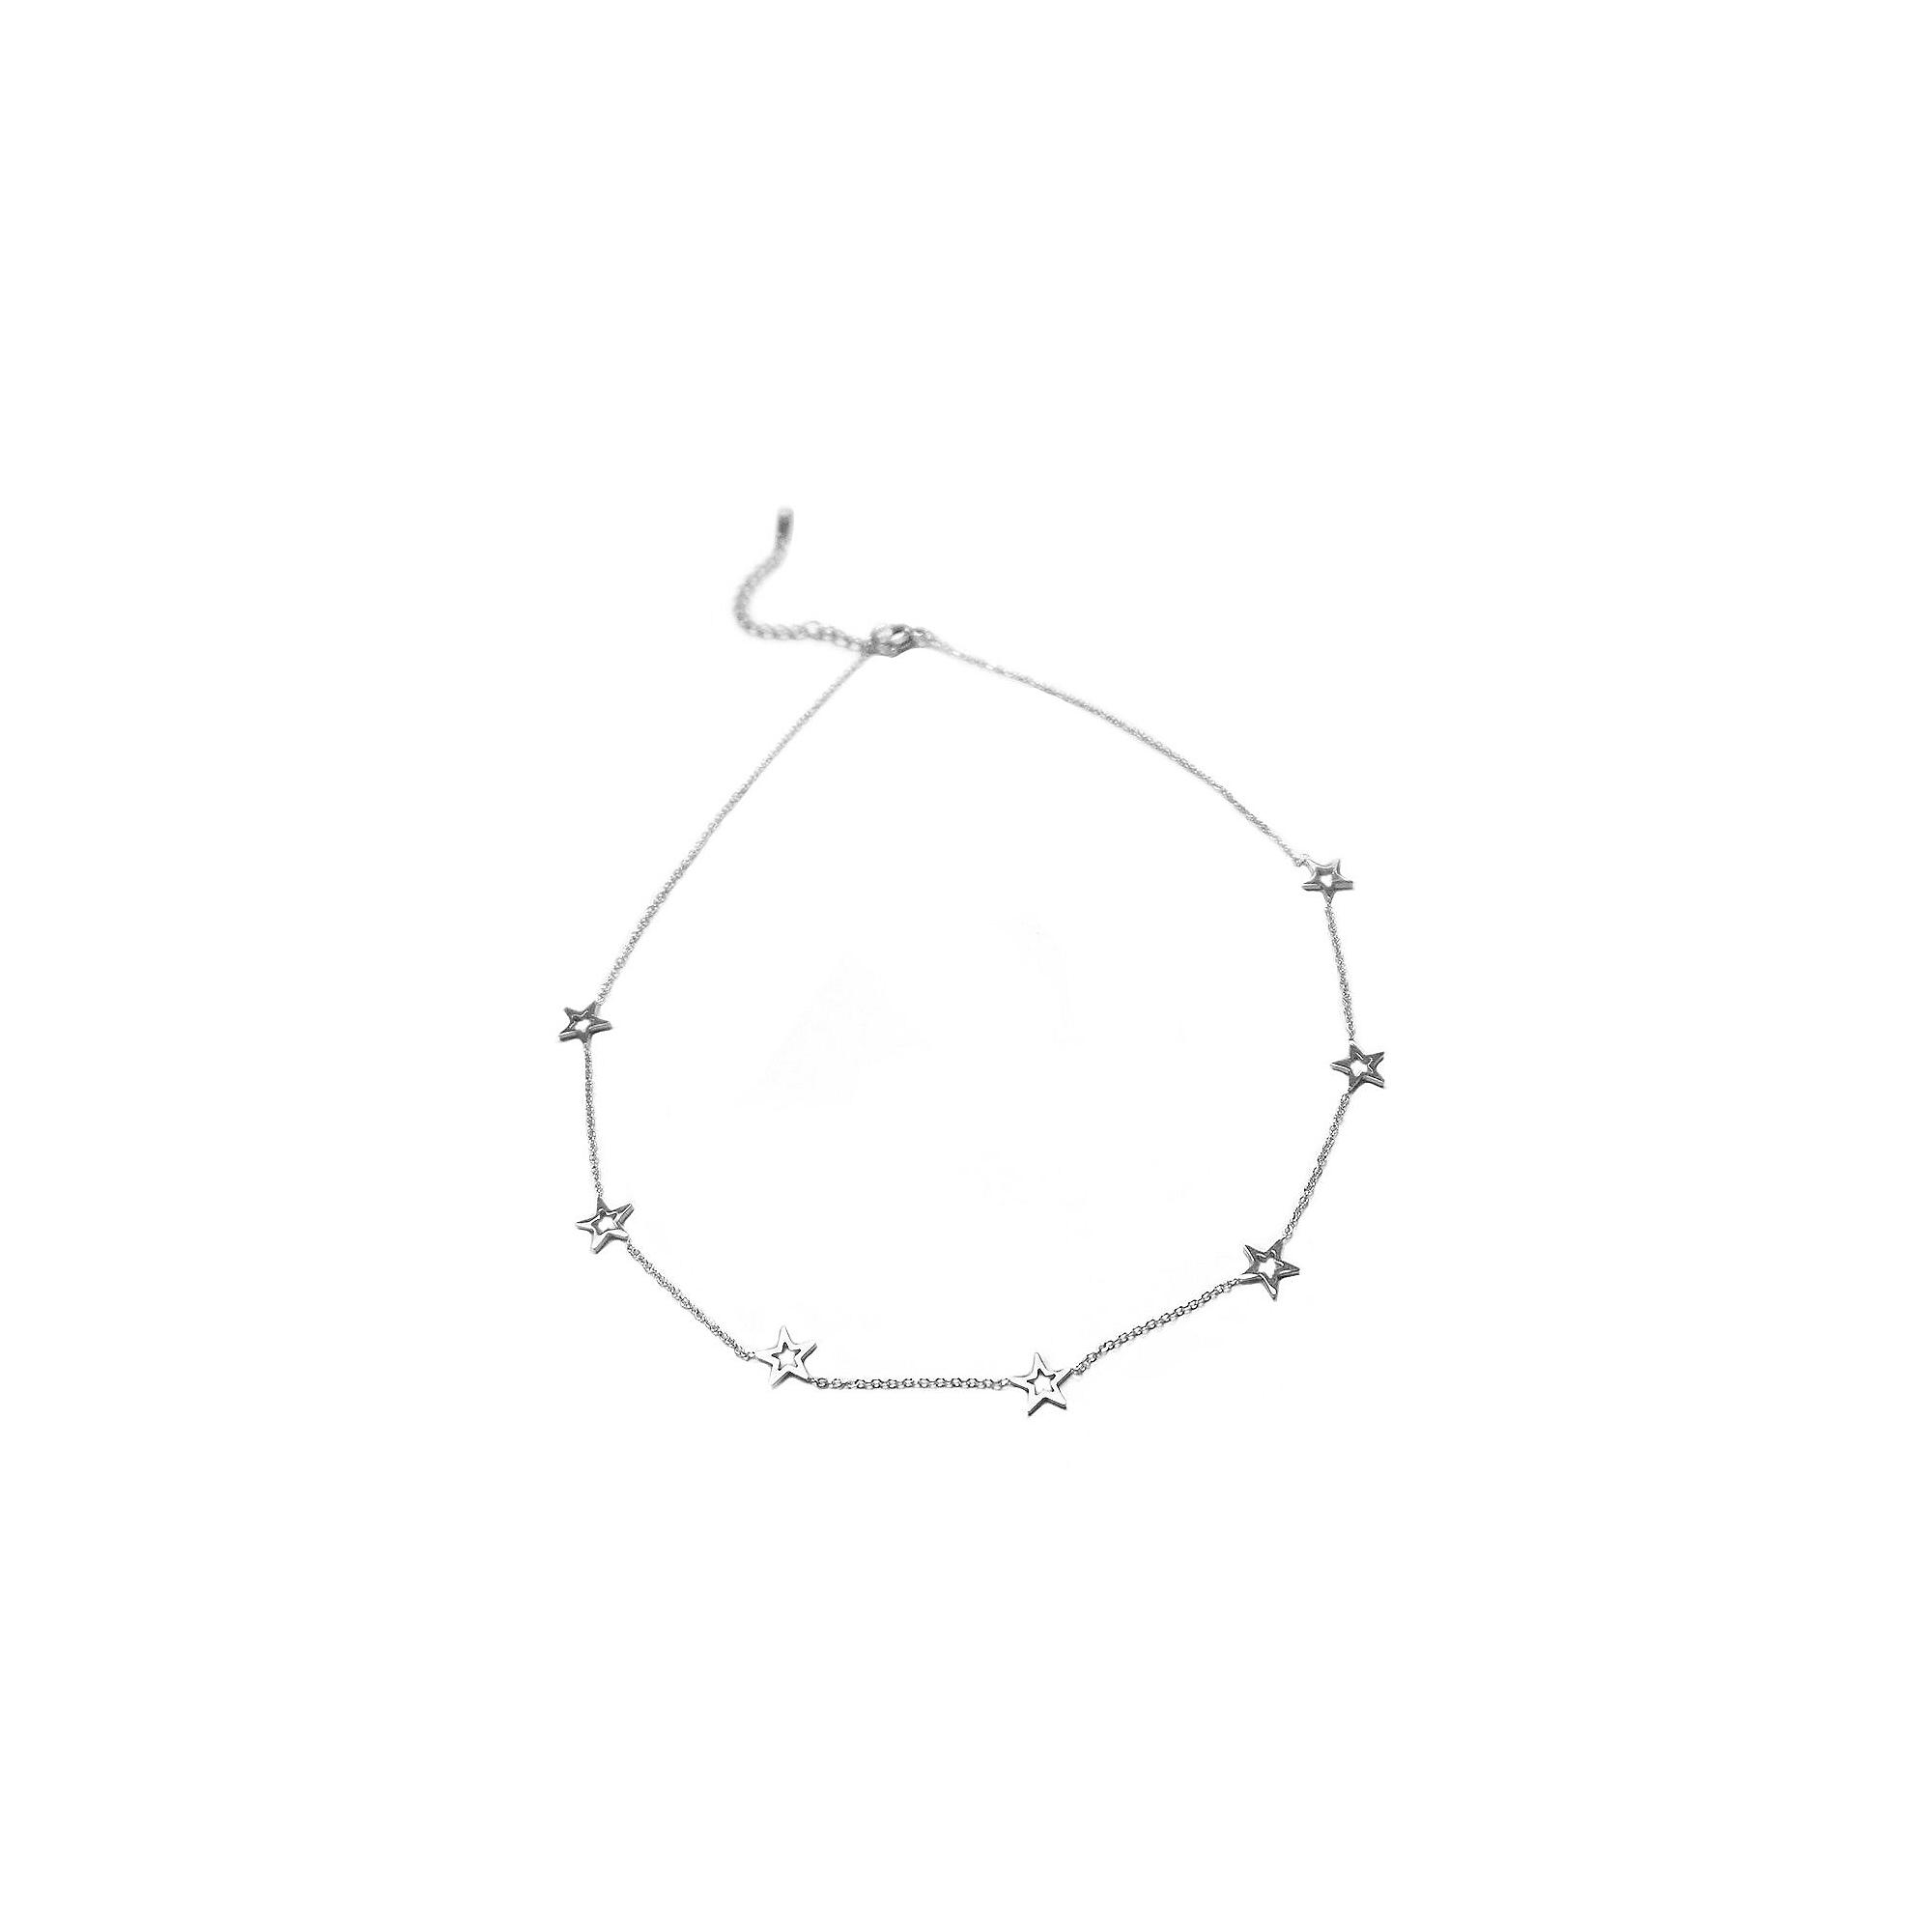 Studio Marlyn Schiff Silver Open Star Necklace